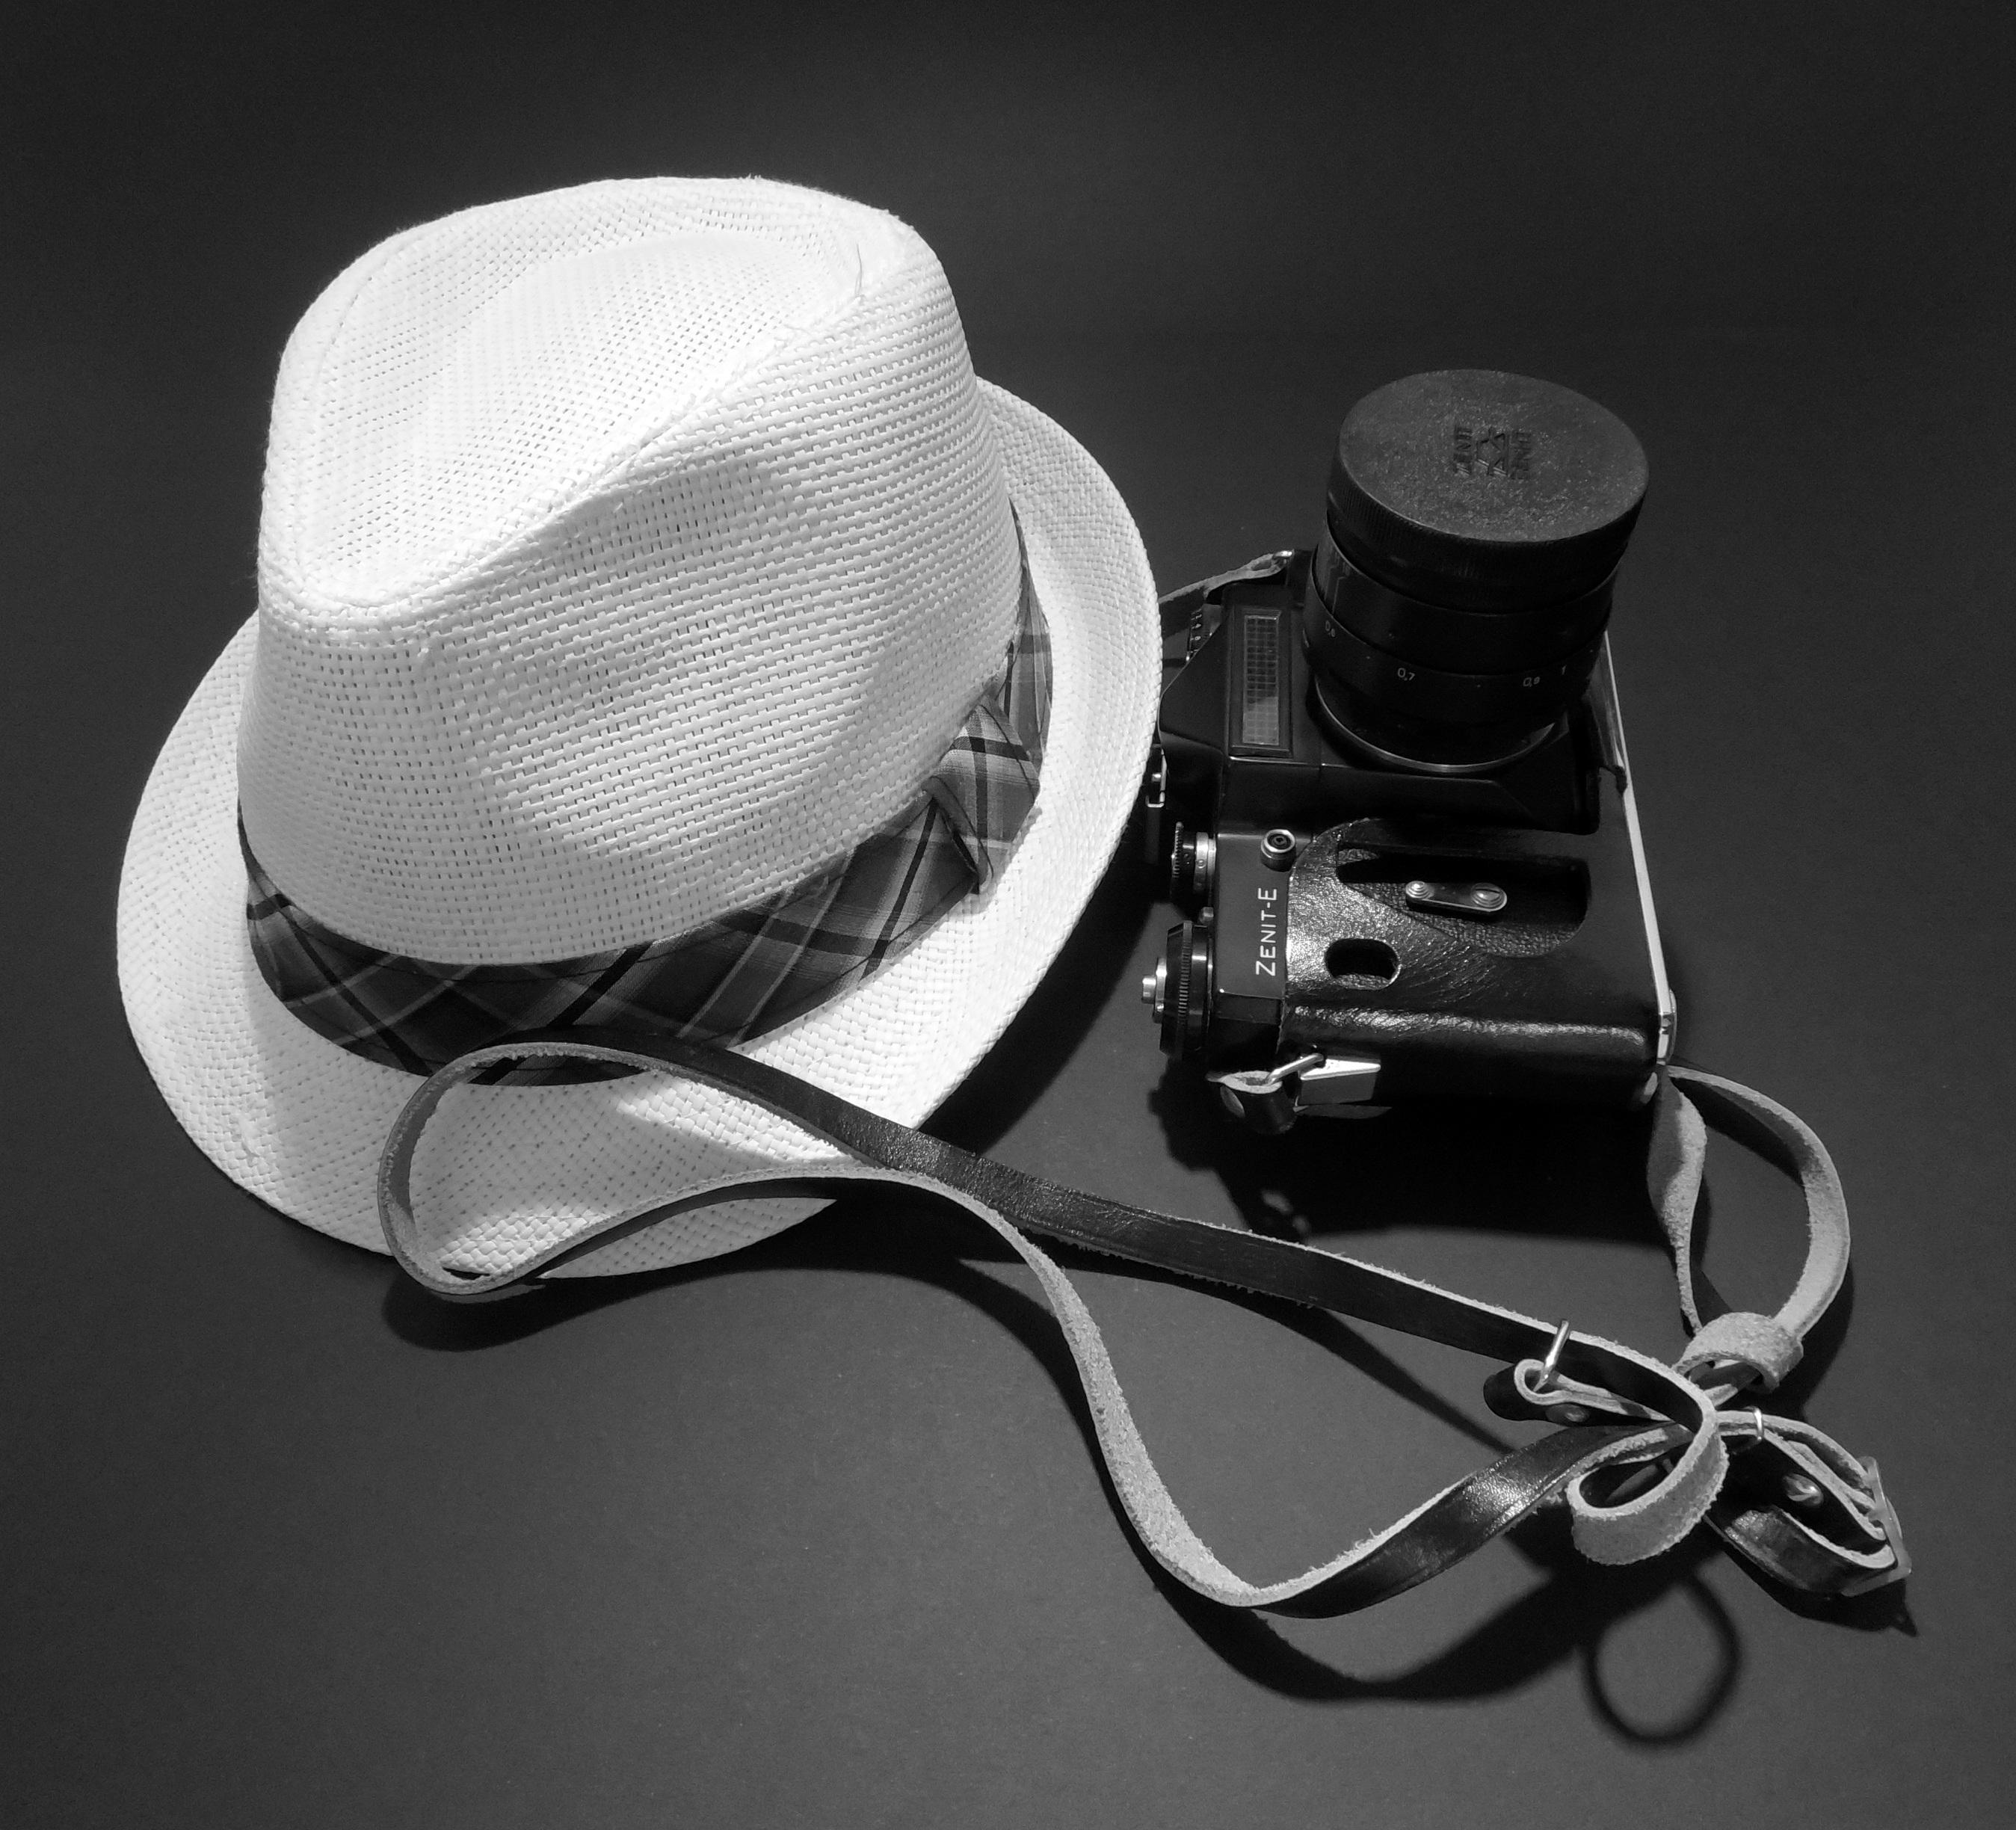 99de892fd3790 black and white white camera vintage retro hat nostalgia clothing black  monochrome straw hat product glasses